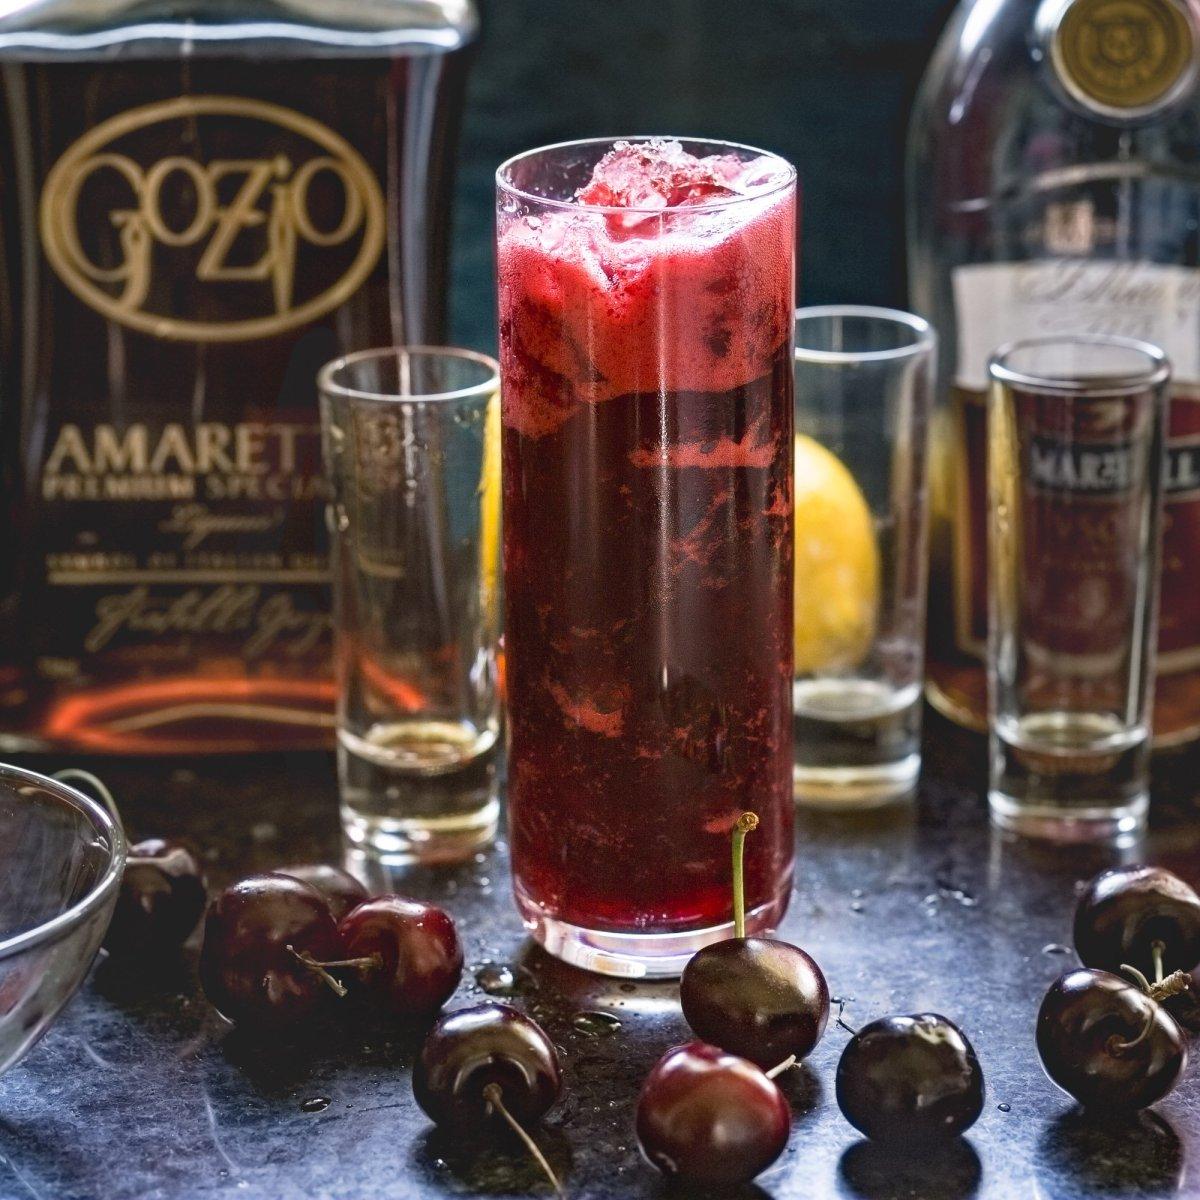 Cherry Amaretto Sidecar Cocktail